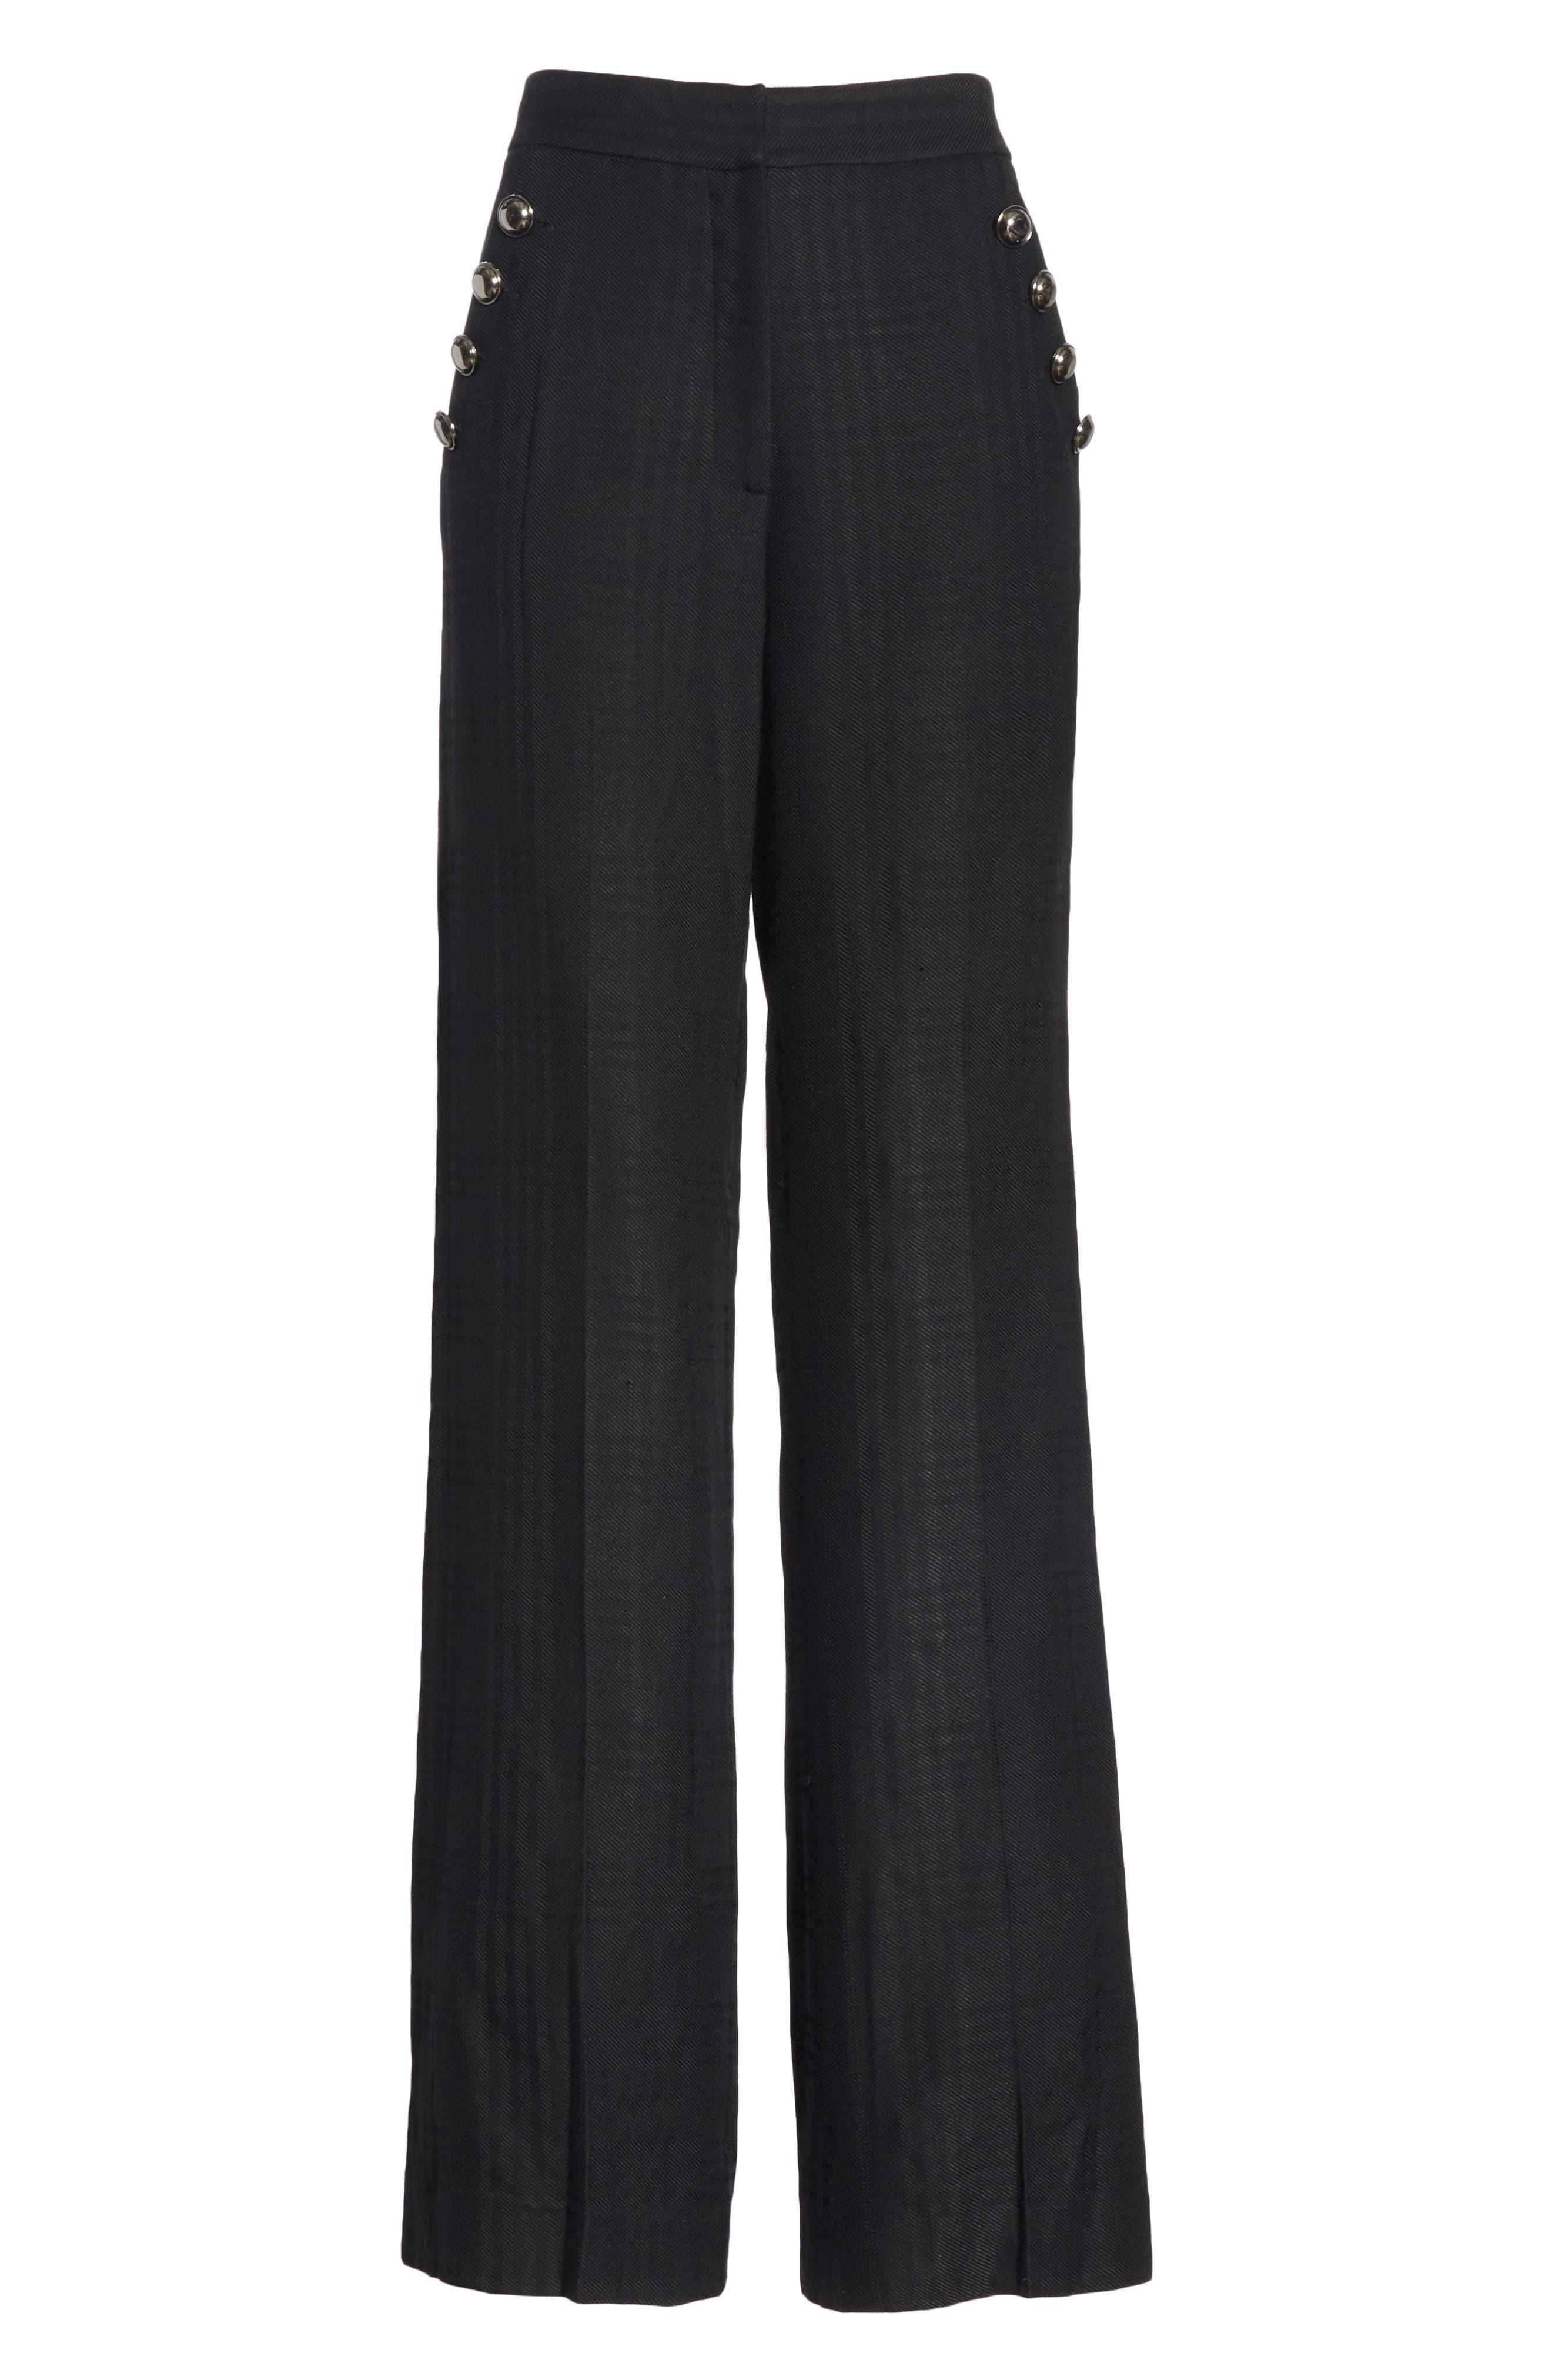 Tuli Check Button Detail Pants,                             Alternate thumbnail 6, color,                             BLACK/ BLACK